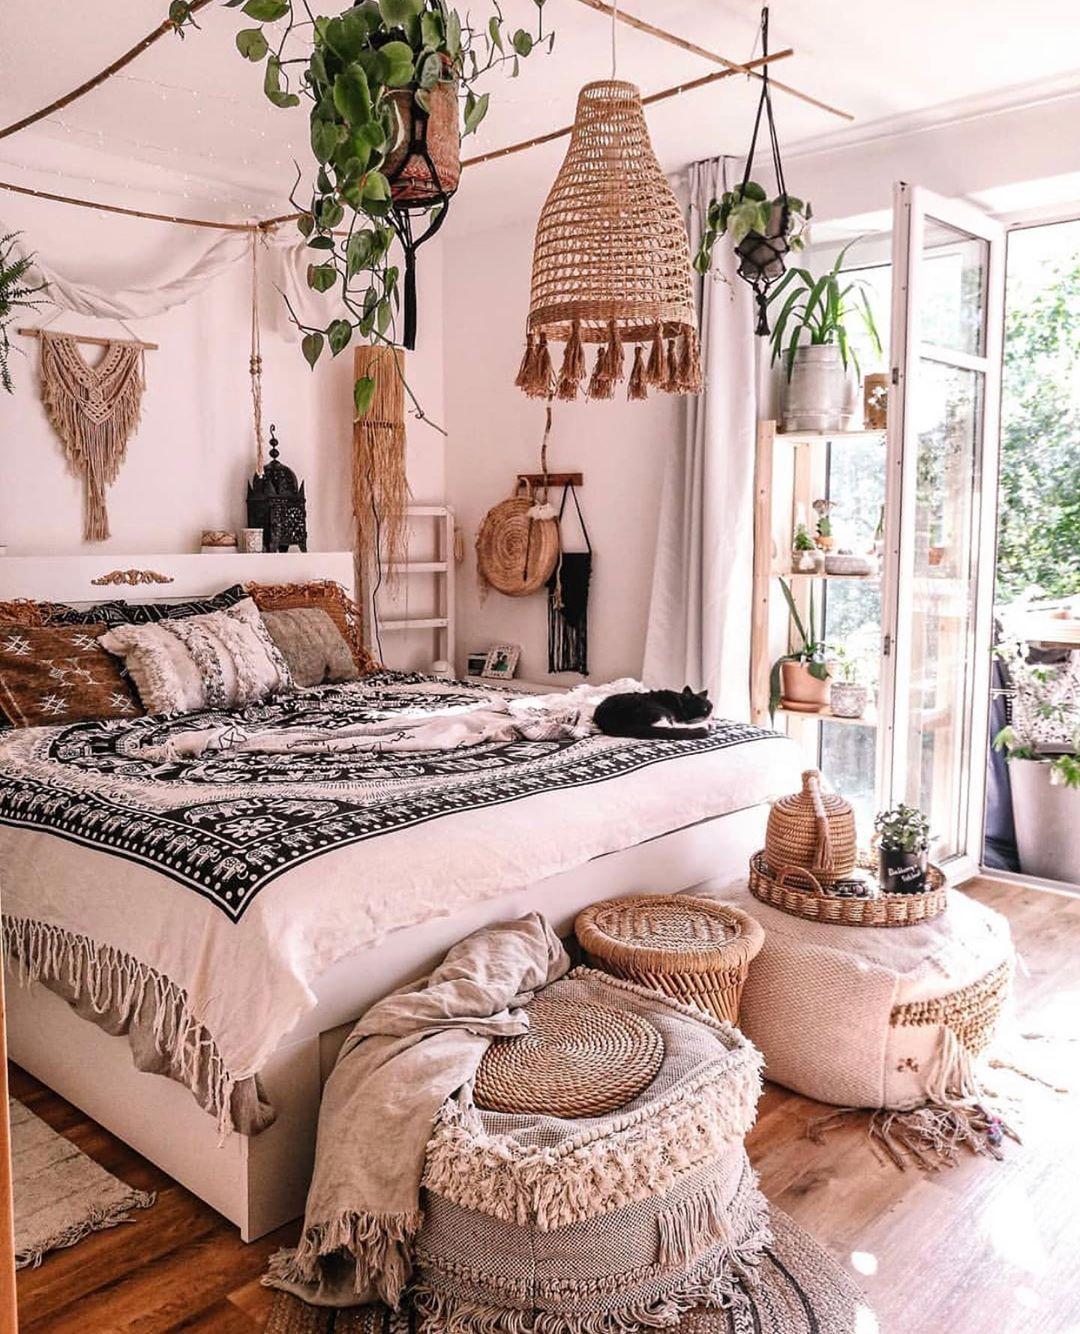 Omg Loving This Boho Room By Kalk Katt What Do You Think